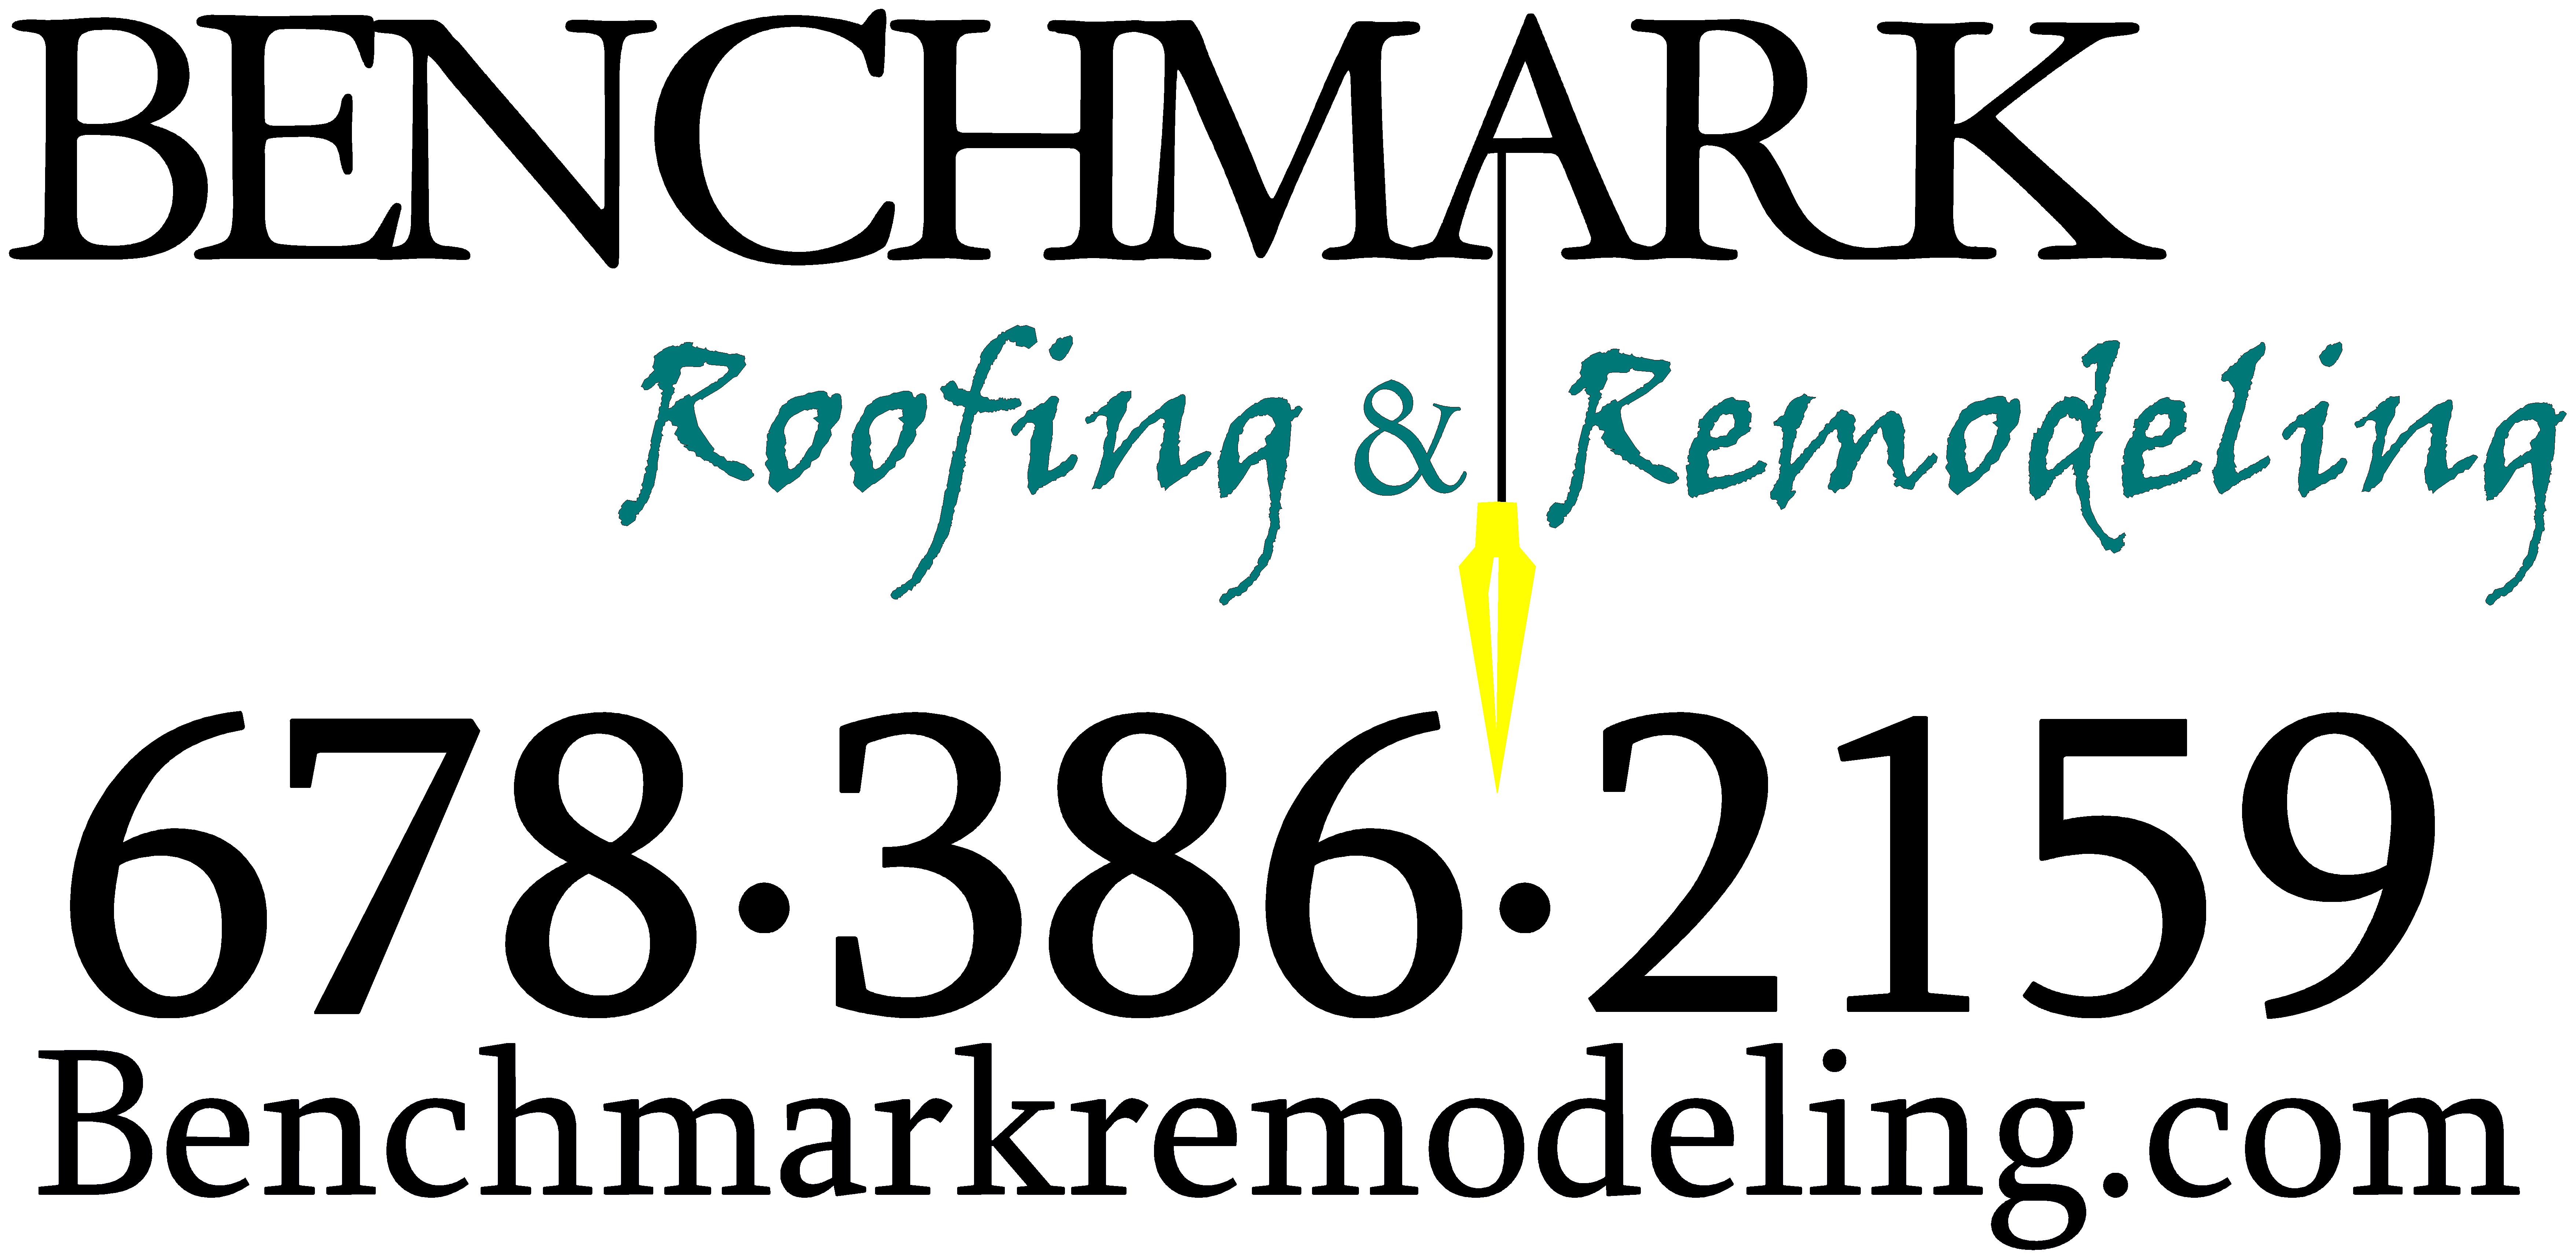 American Roofing Company In Savannah Ga